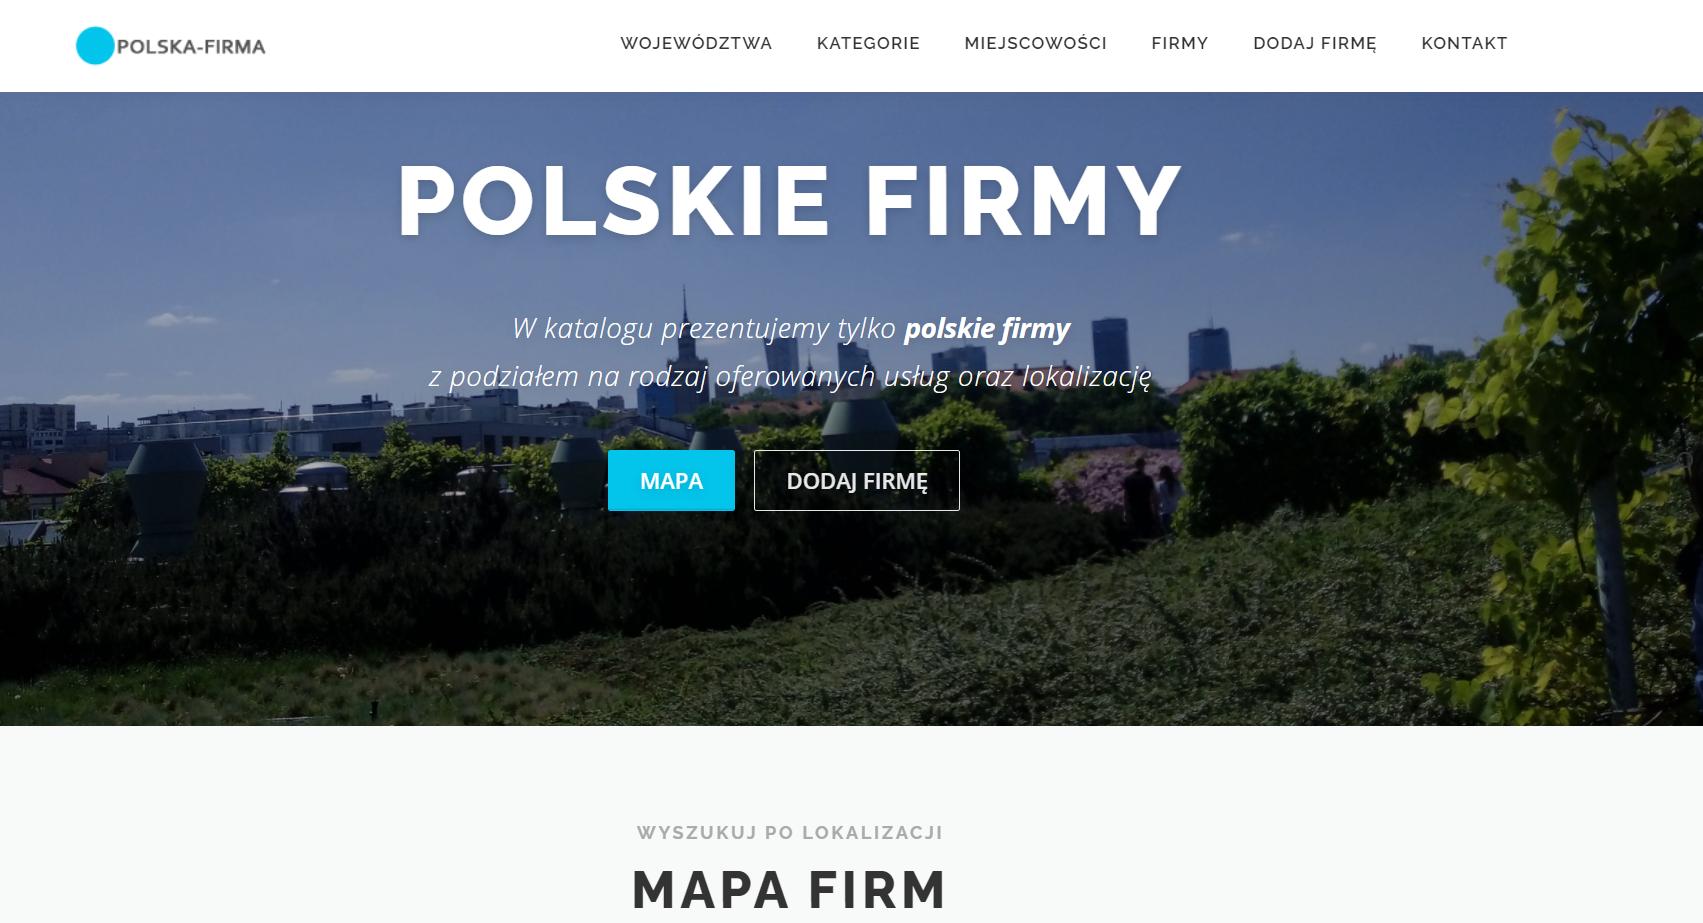 polska-firma